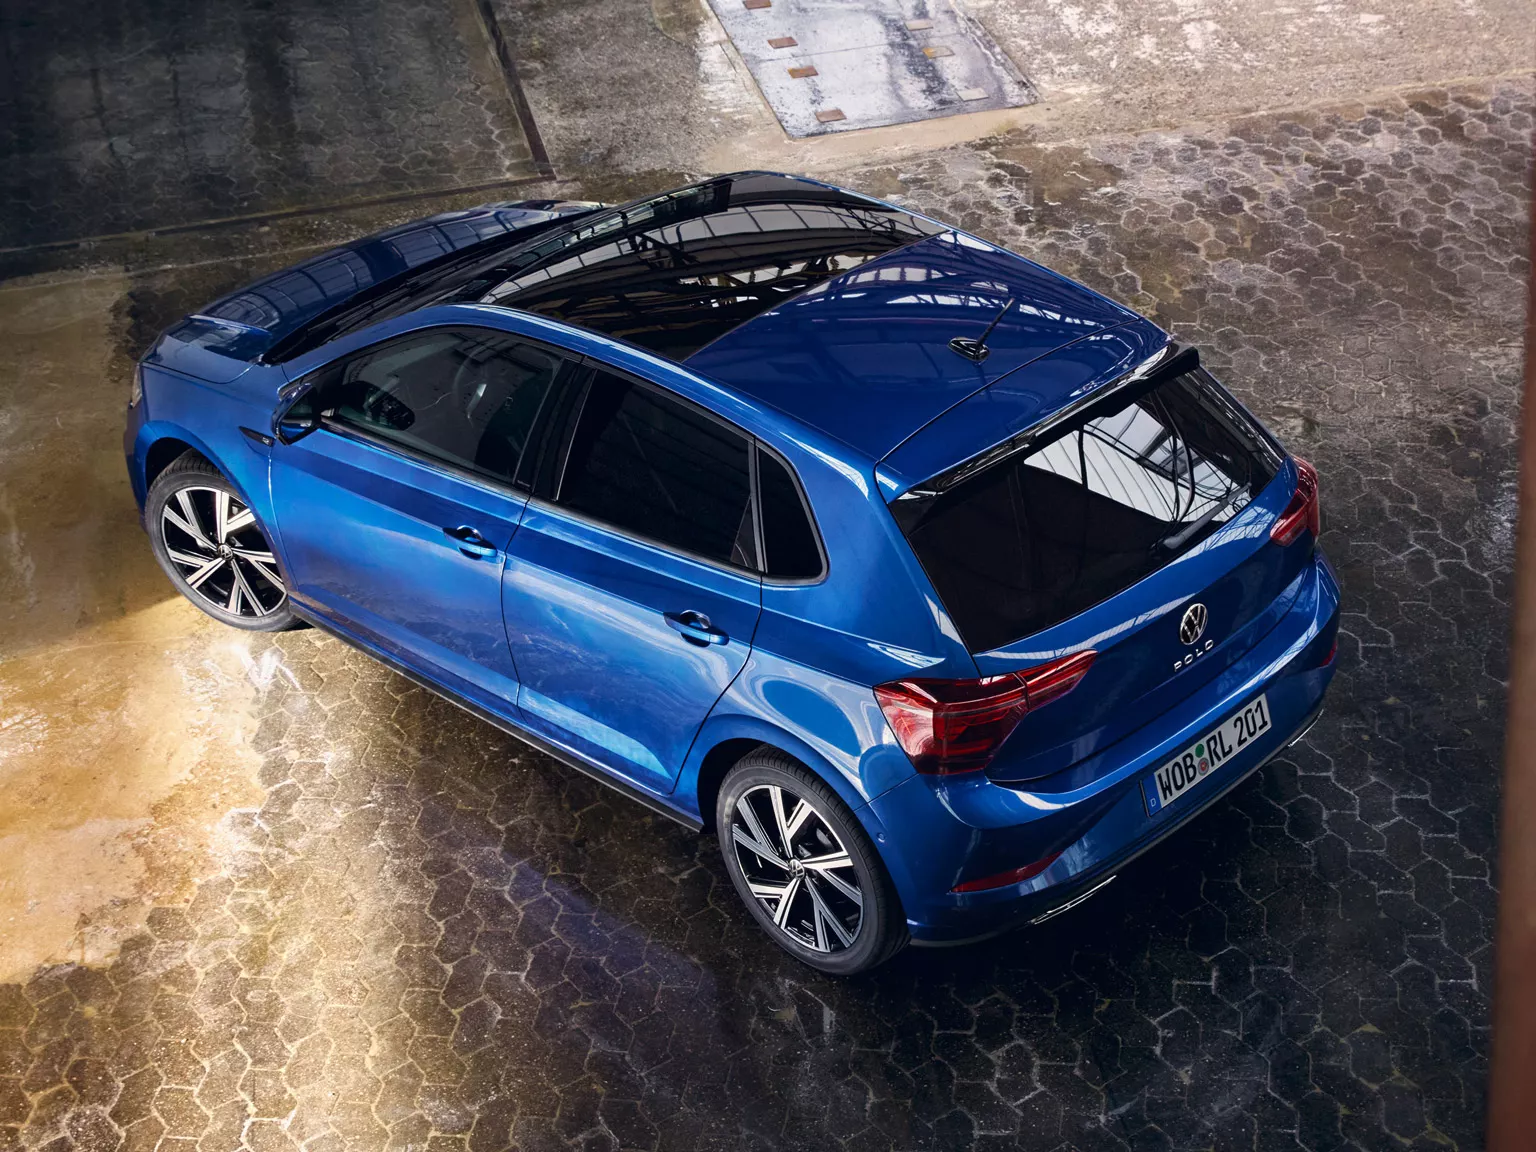 offre n°1 Nouvelle Polo Volkswagen Laval